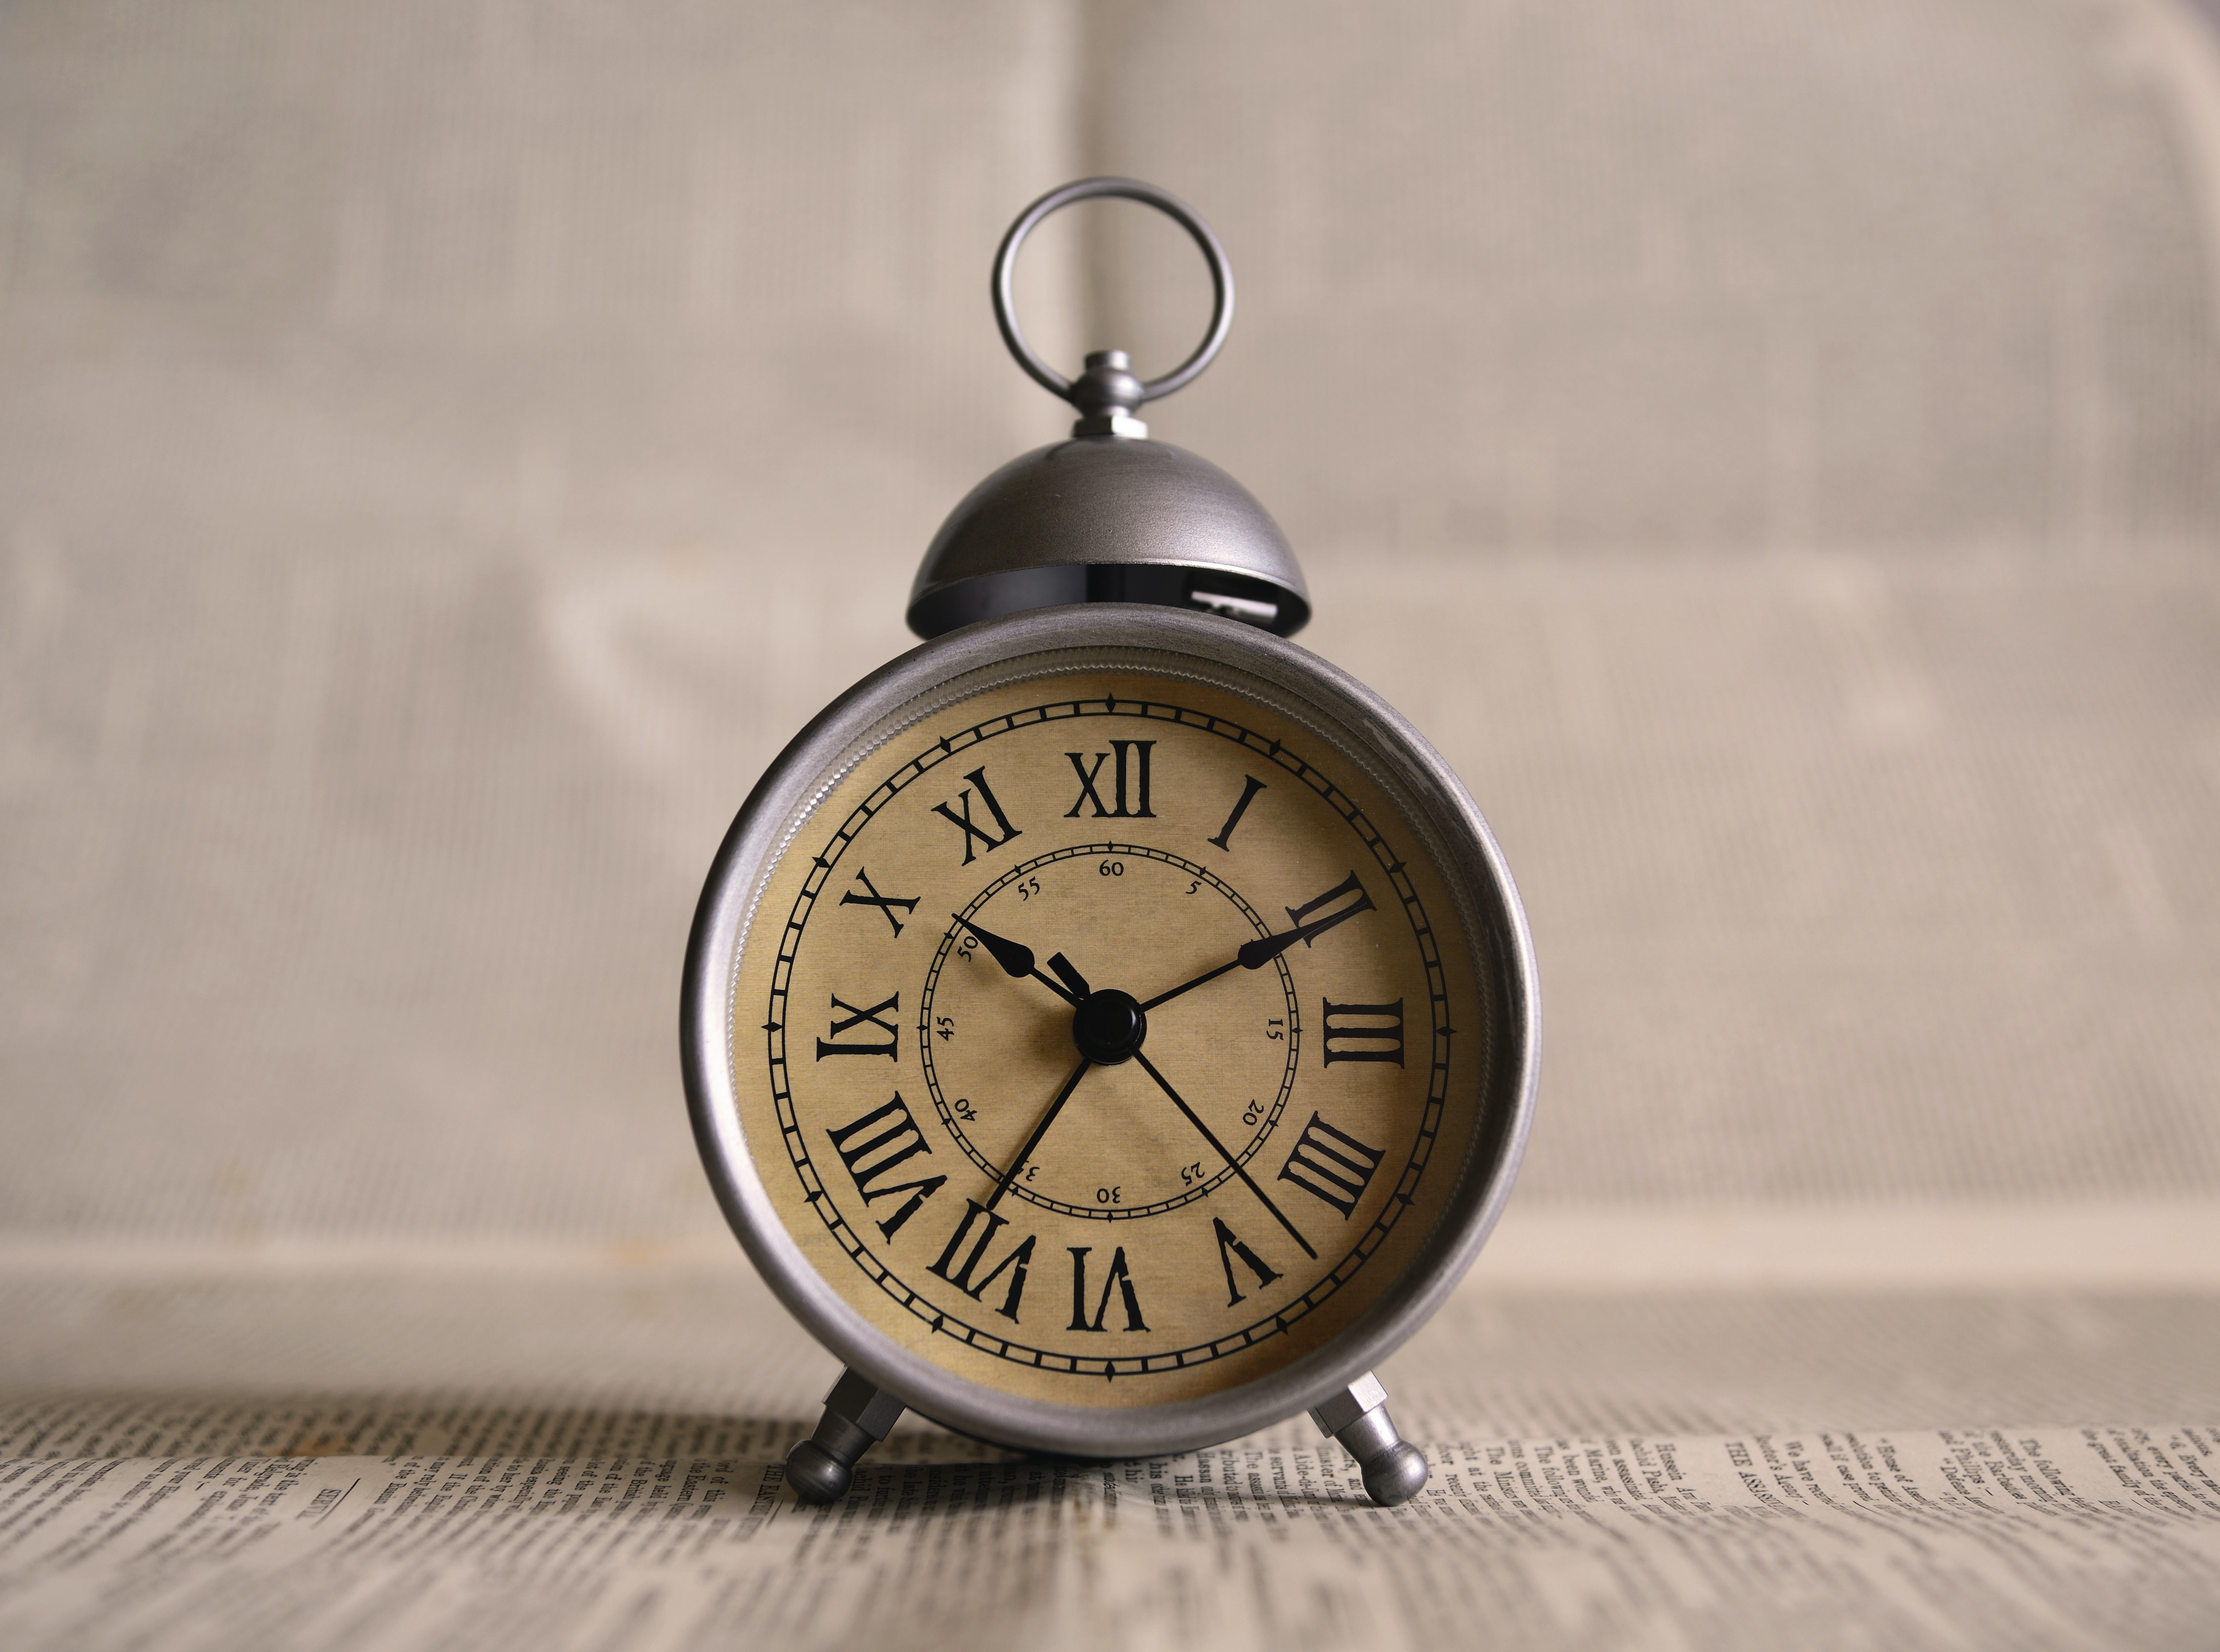 Old-style alarm clock.